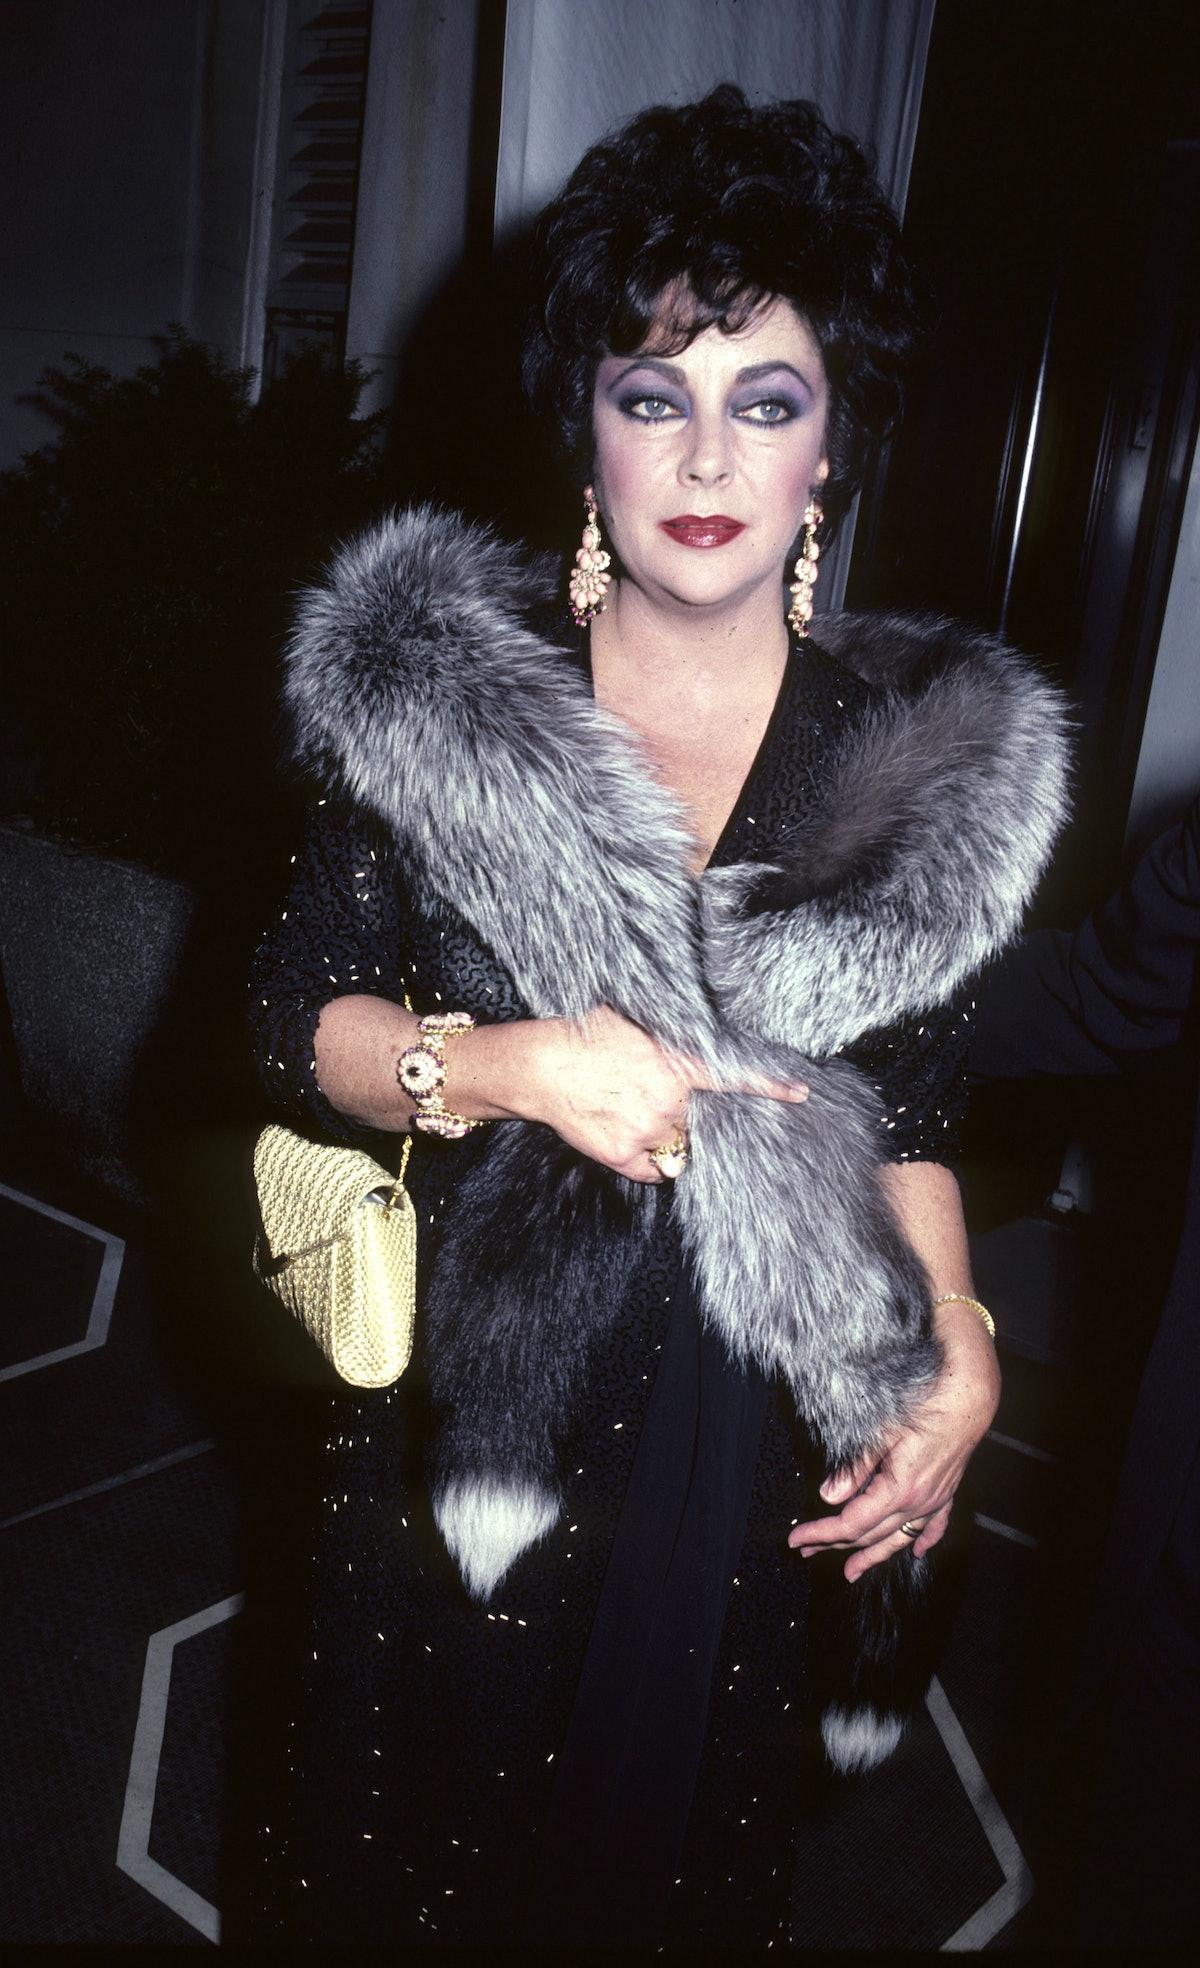 Elizabeth  Taylor  leaving Carlyle Hotel in  New York - December 1, 1980